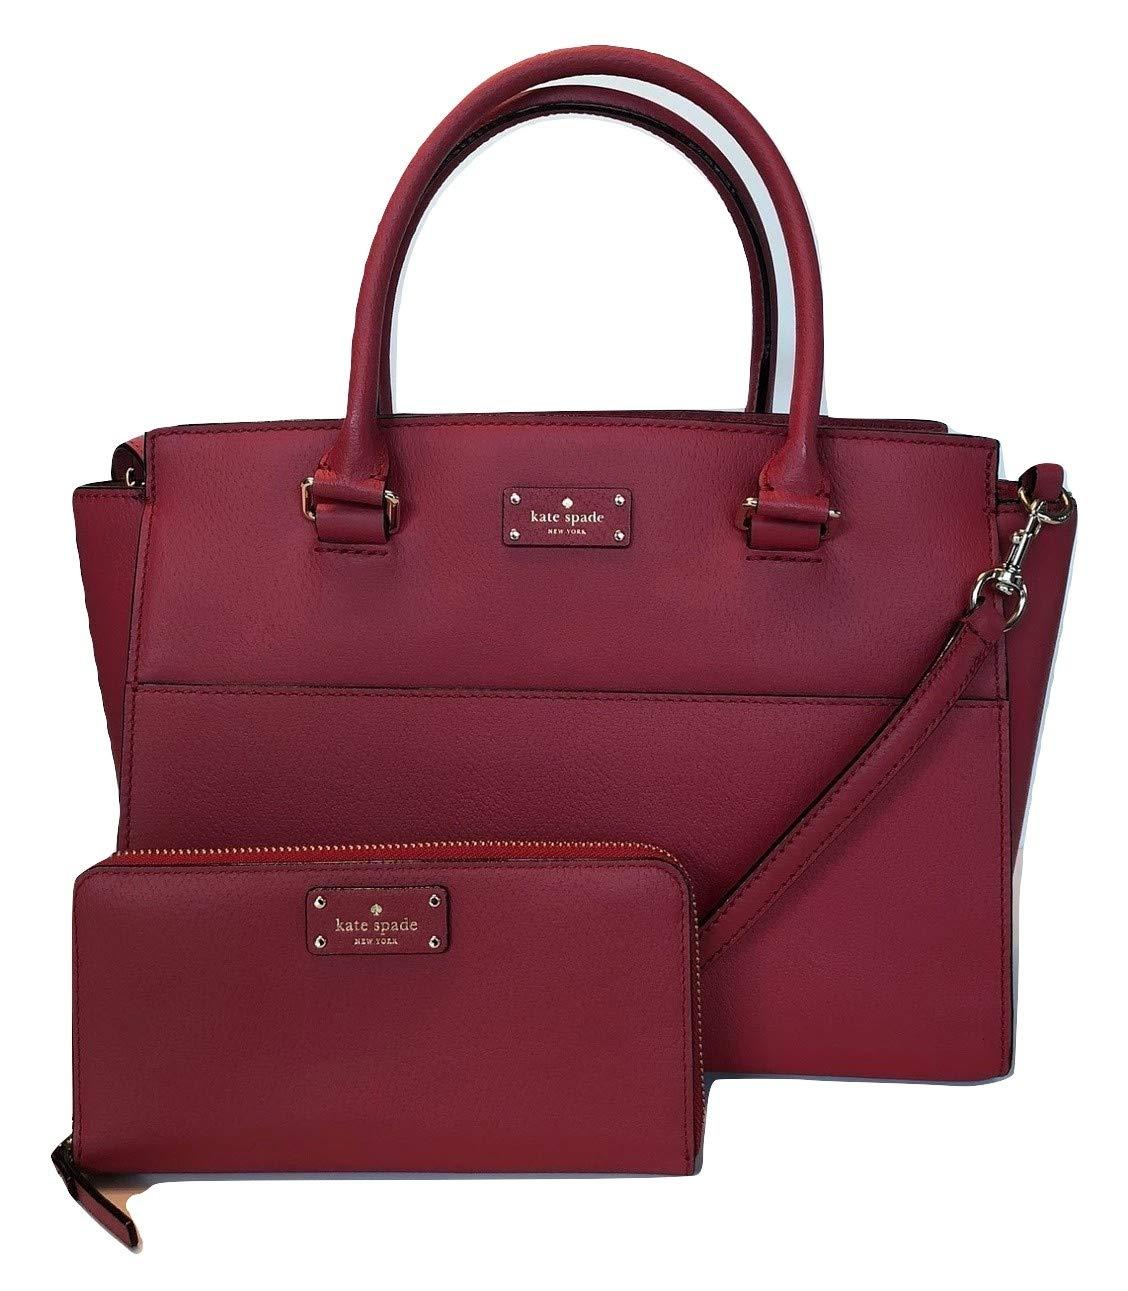 fb1e71488a Amazon.com: Kate Spade New York Grove Street Lana WKRU5322 Bundled with  Matching Neda Wallet WLRU2820 (Red Carpet): Home & Kitchen